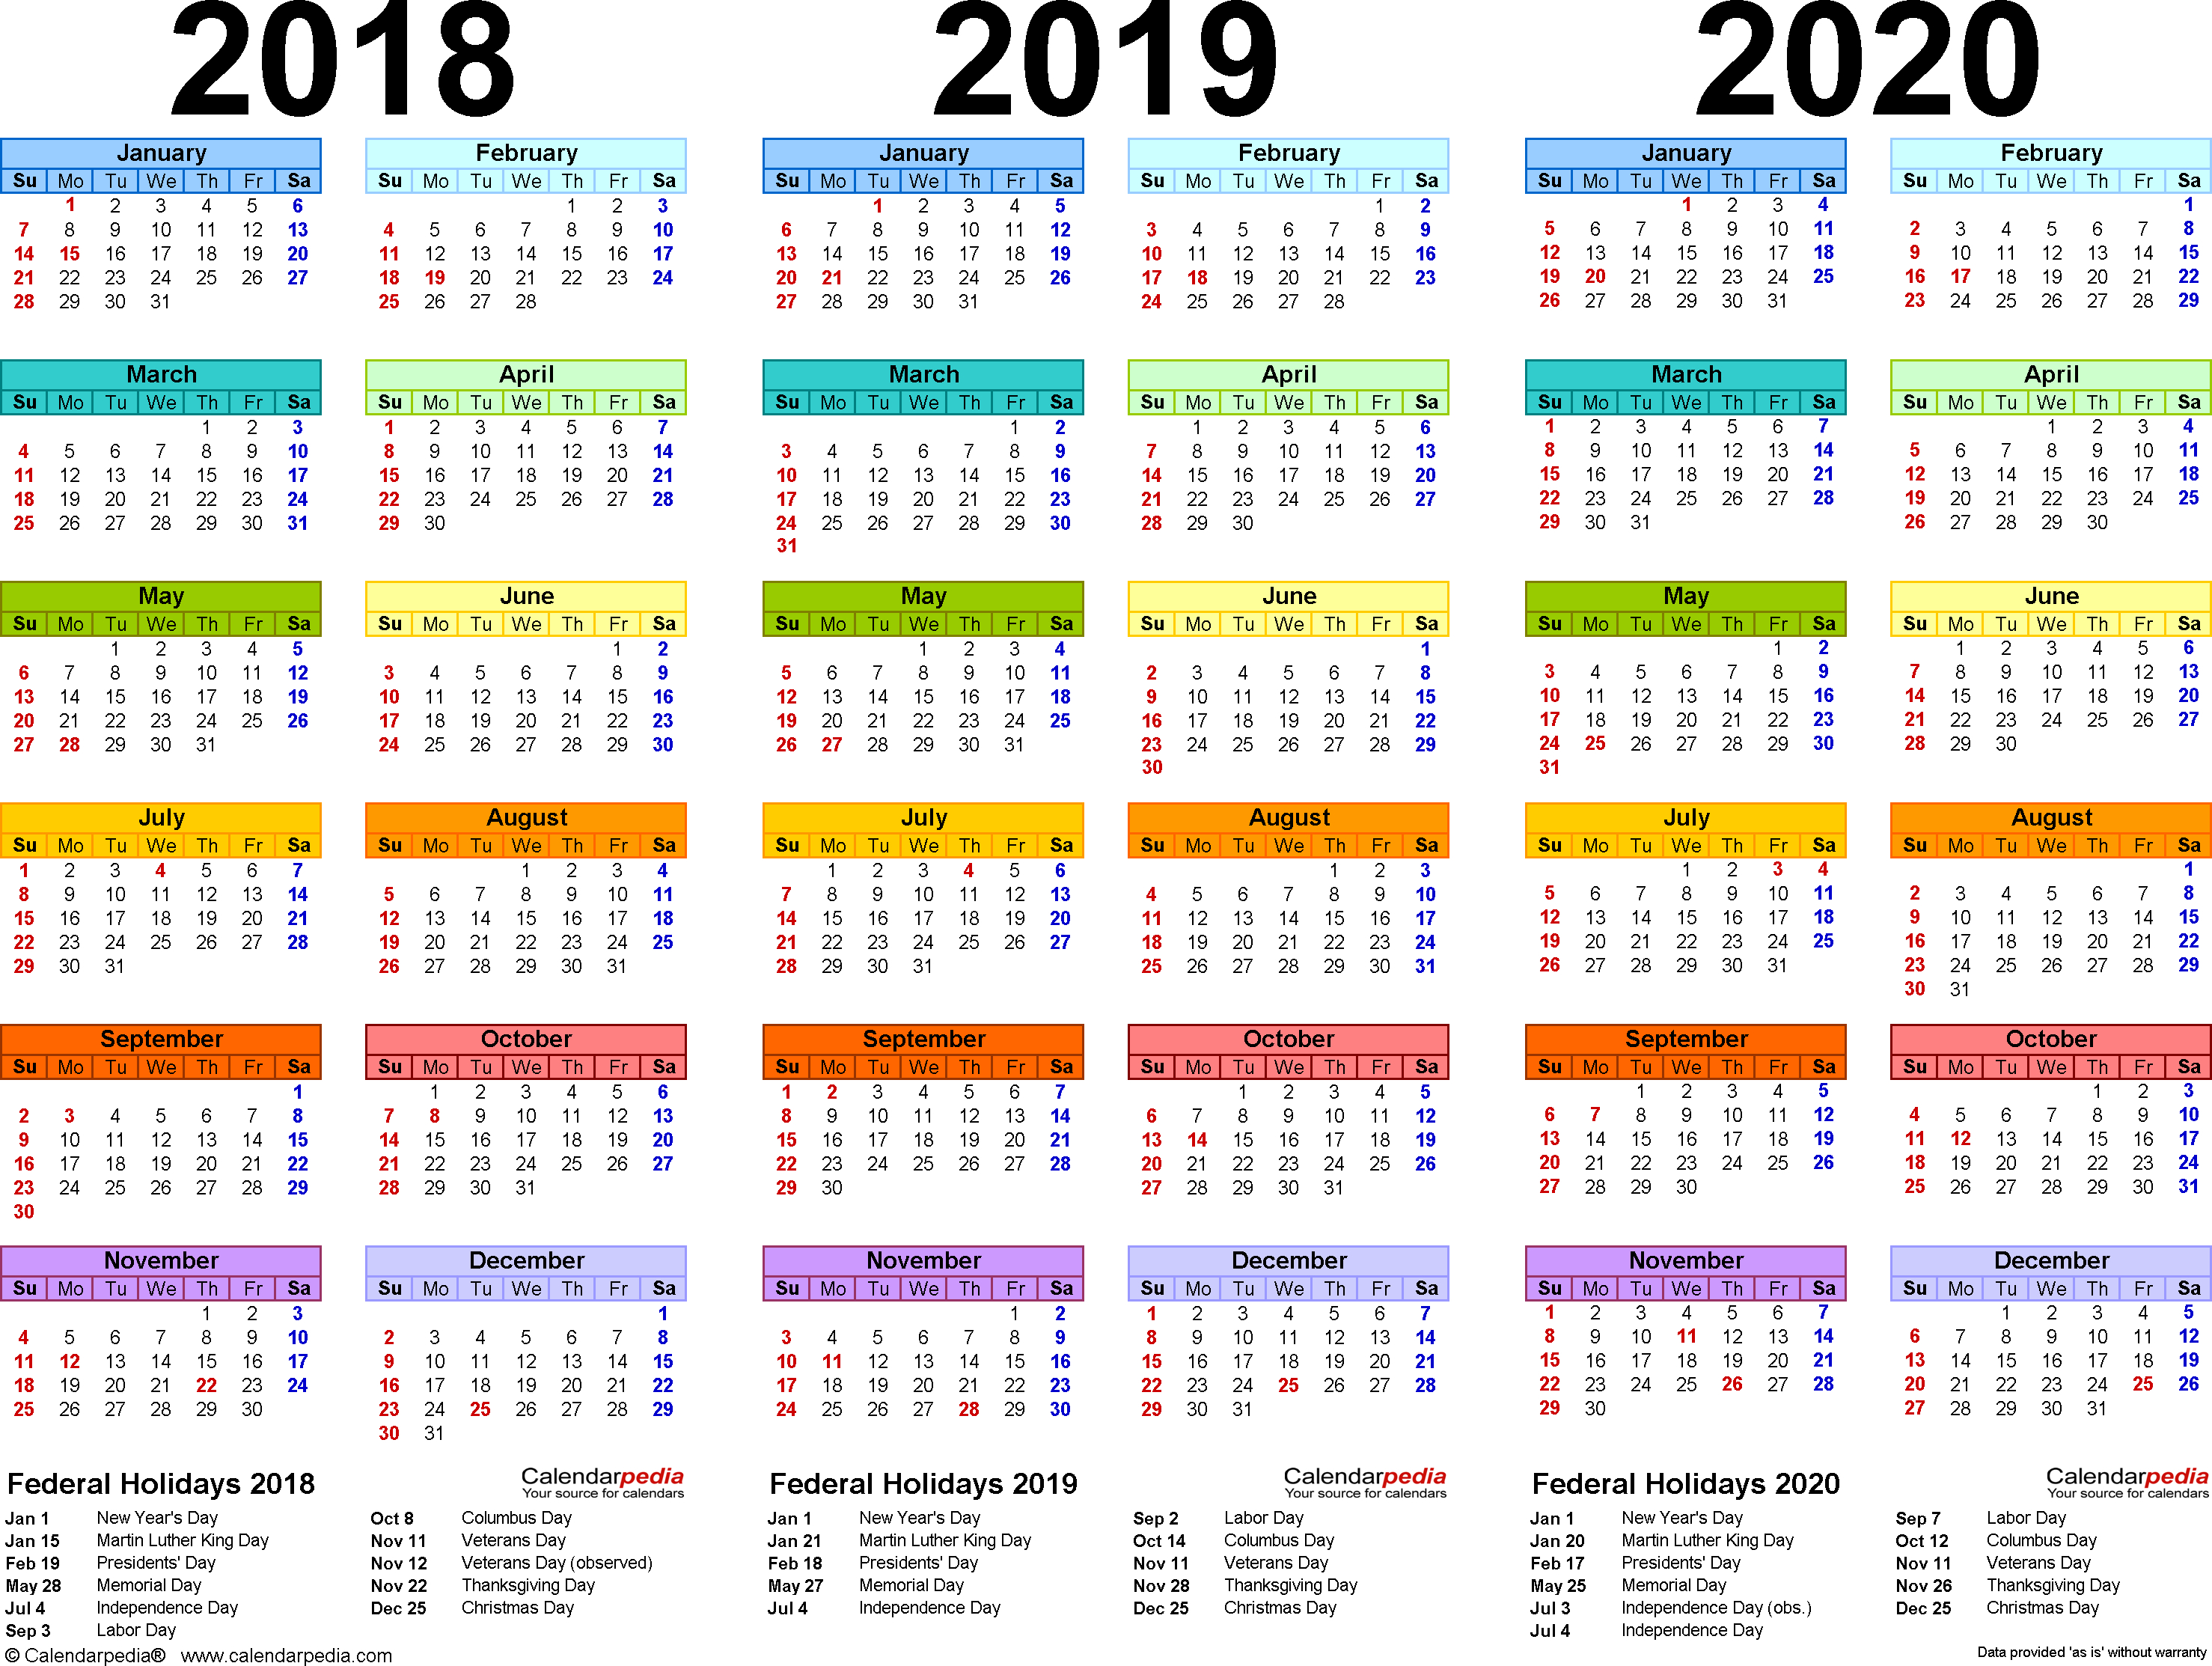 2018/2019/2020 Calendar - 4 Three-Year Printable Pdf Calendars regarding Free Printable 3 Year Calendar 2019 2020 2021